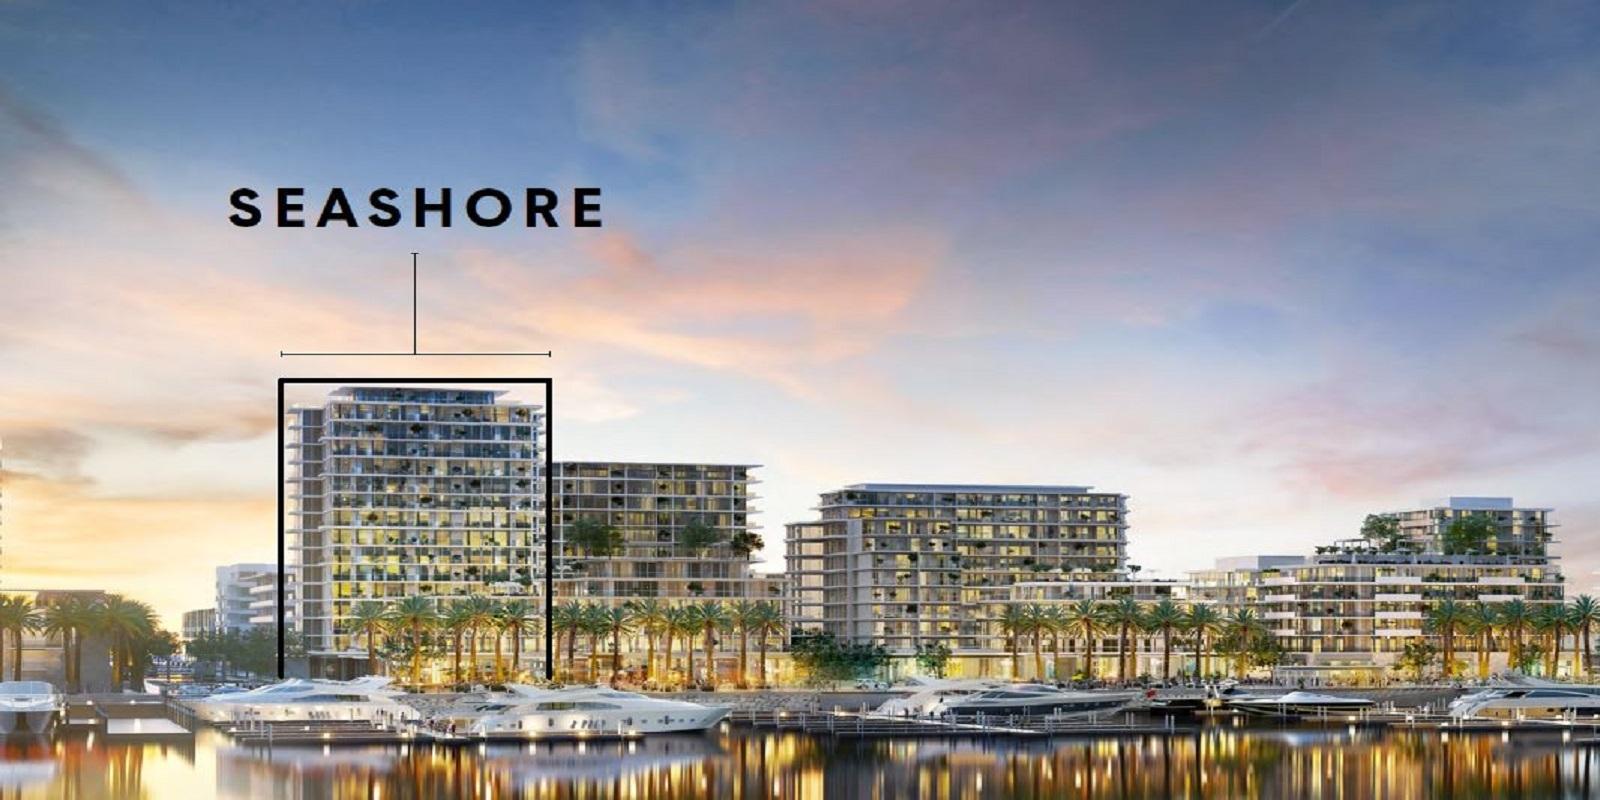 emaar seashore project tower view1